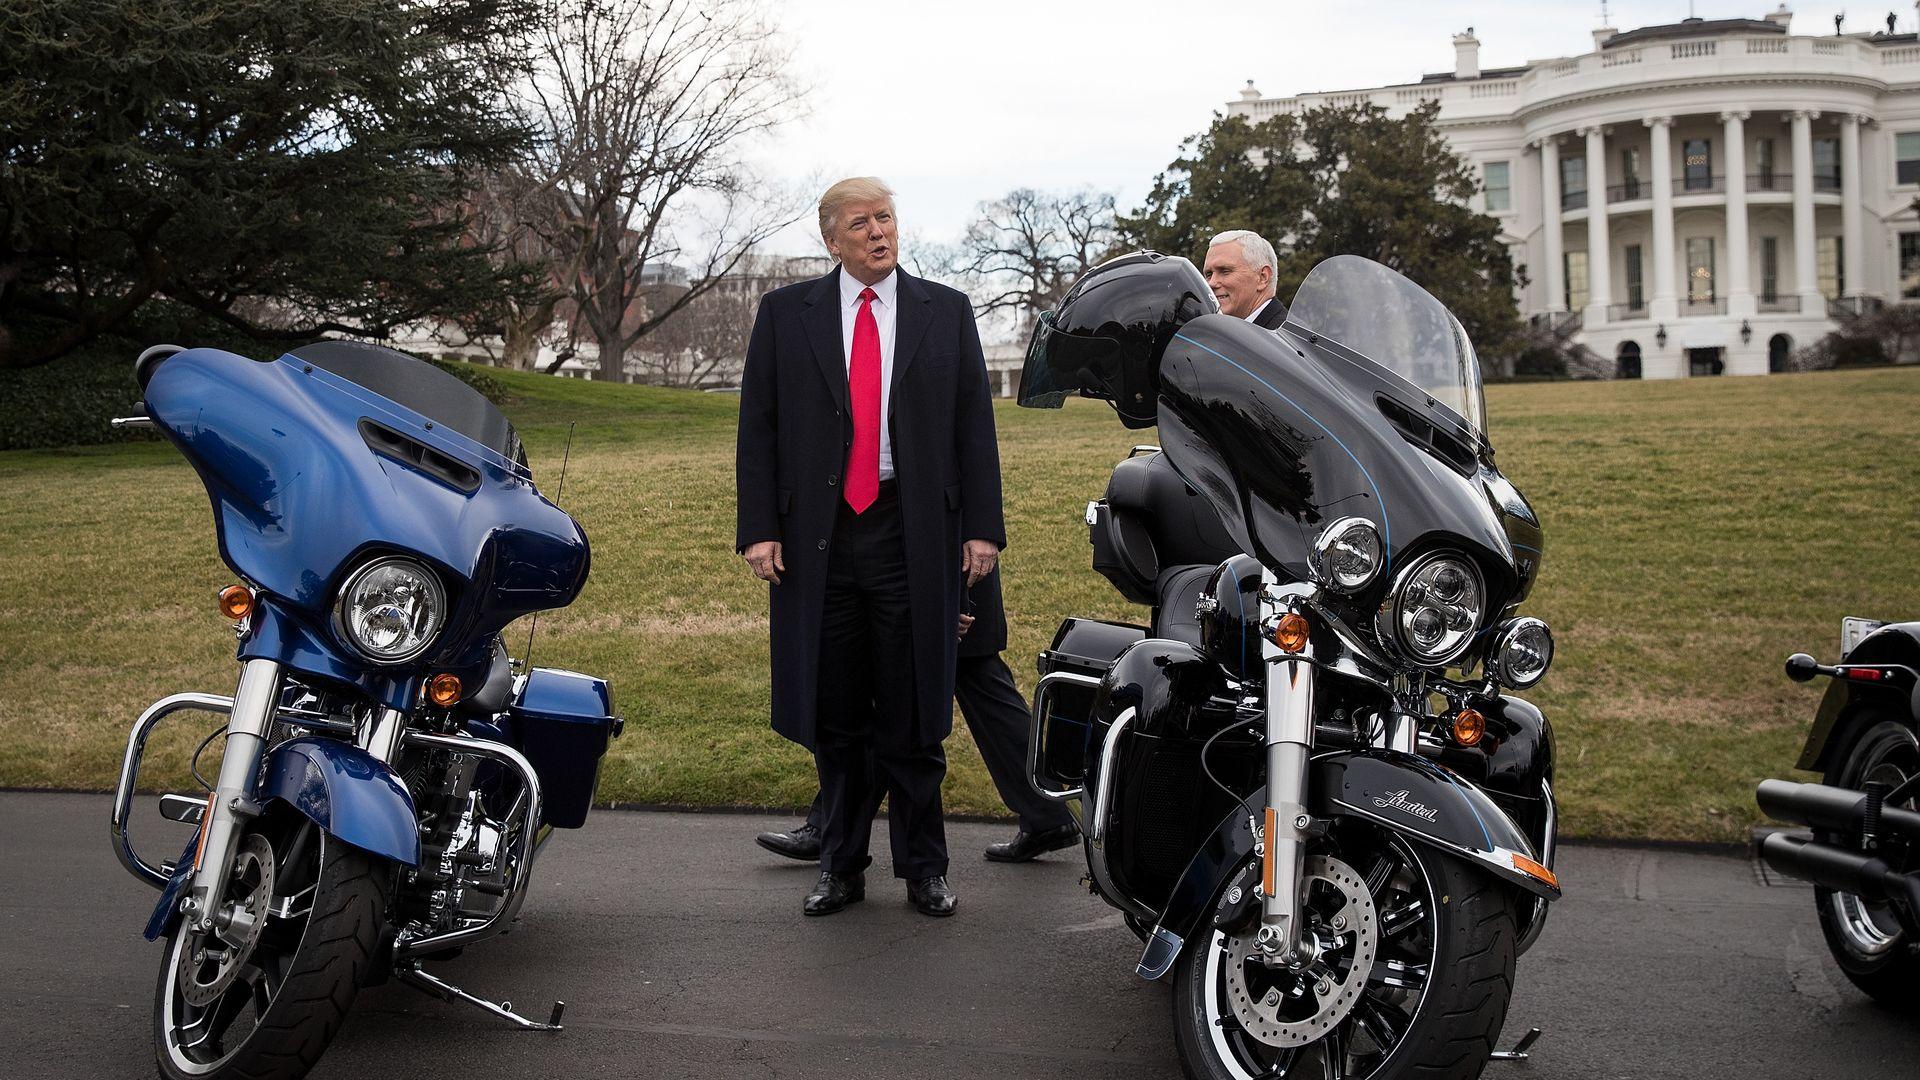 Trump defends Harley Davidson after encouraging boycott last year